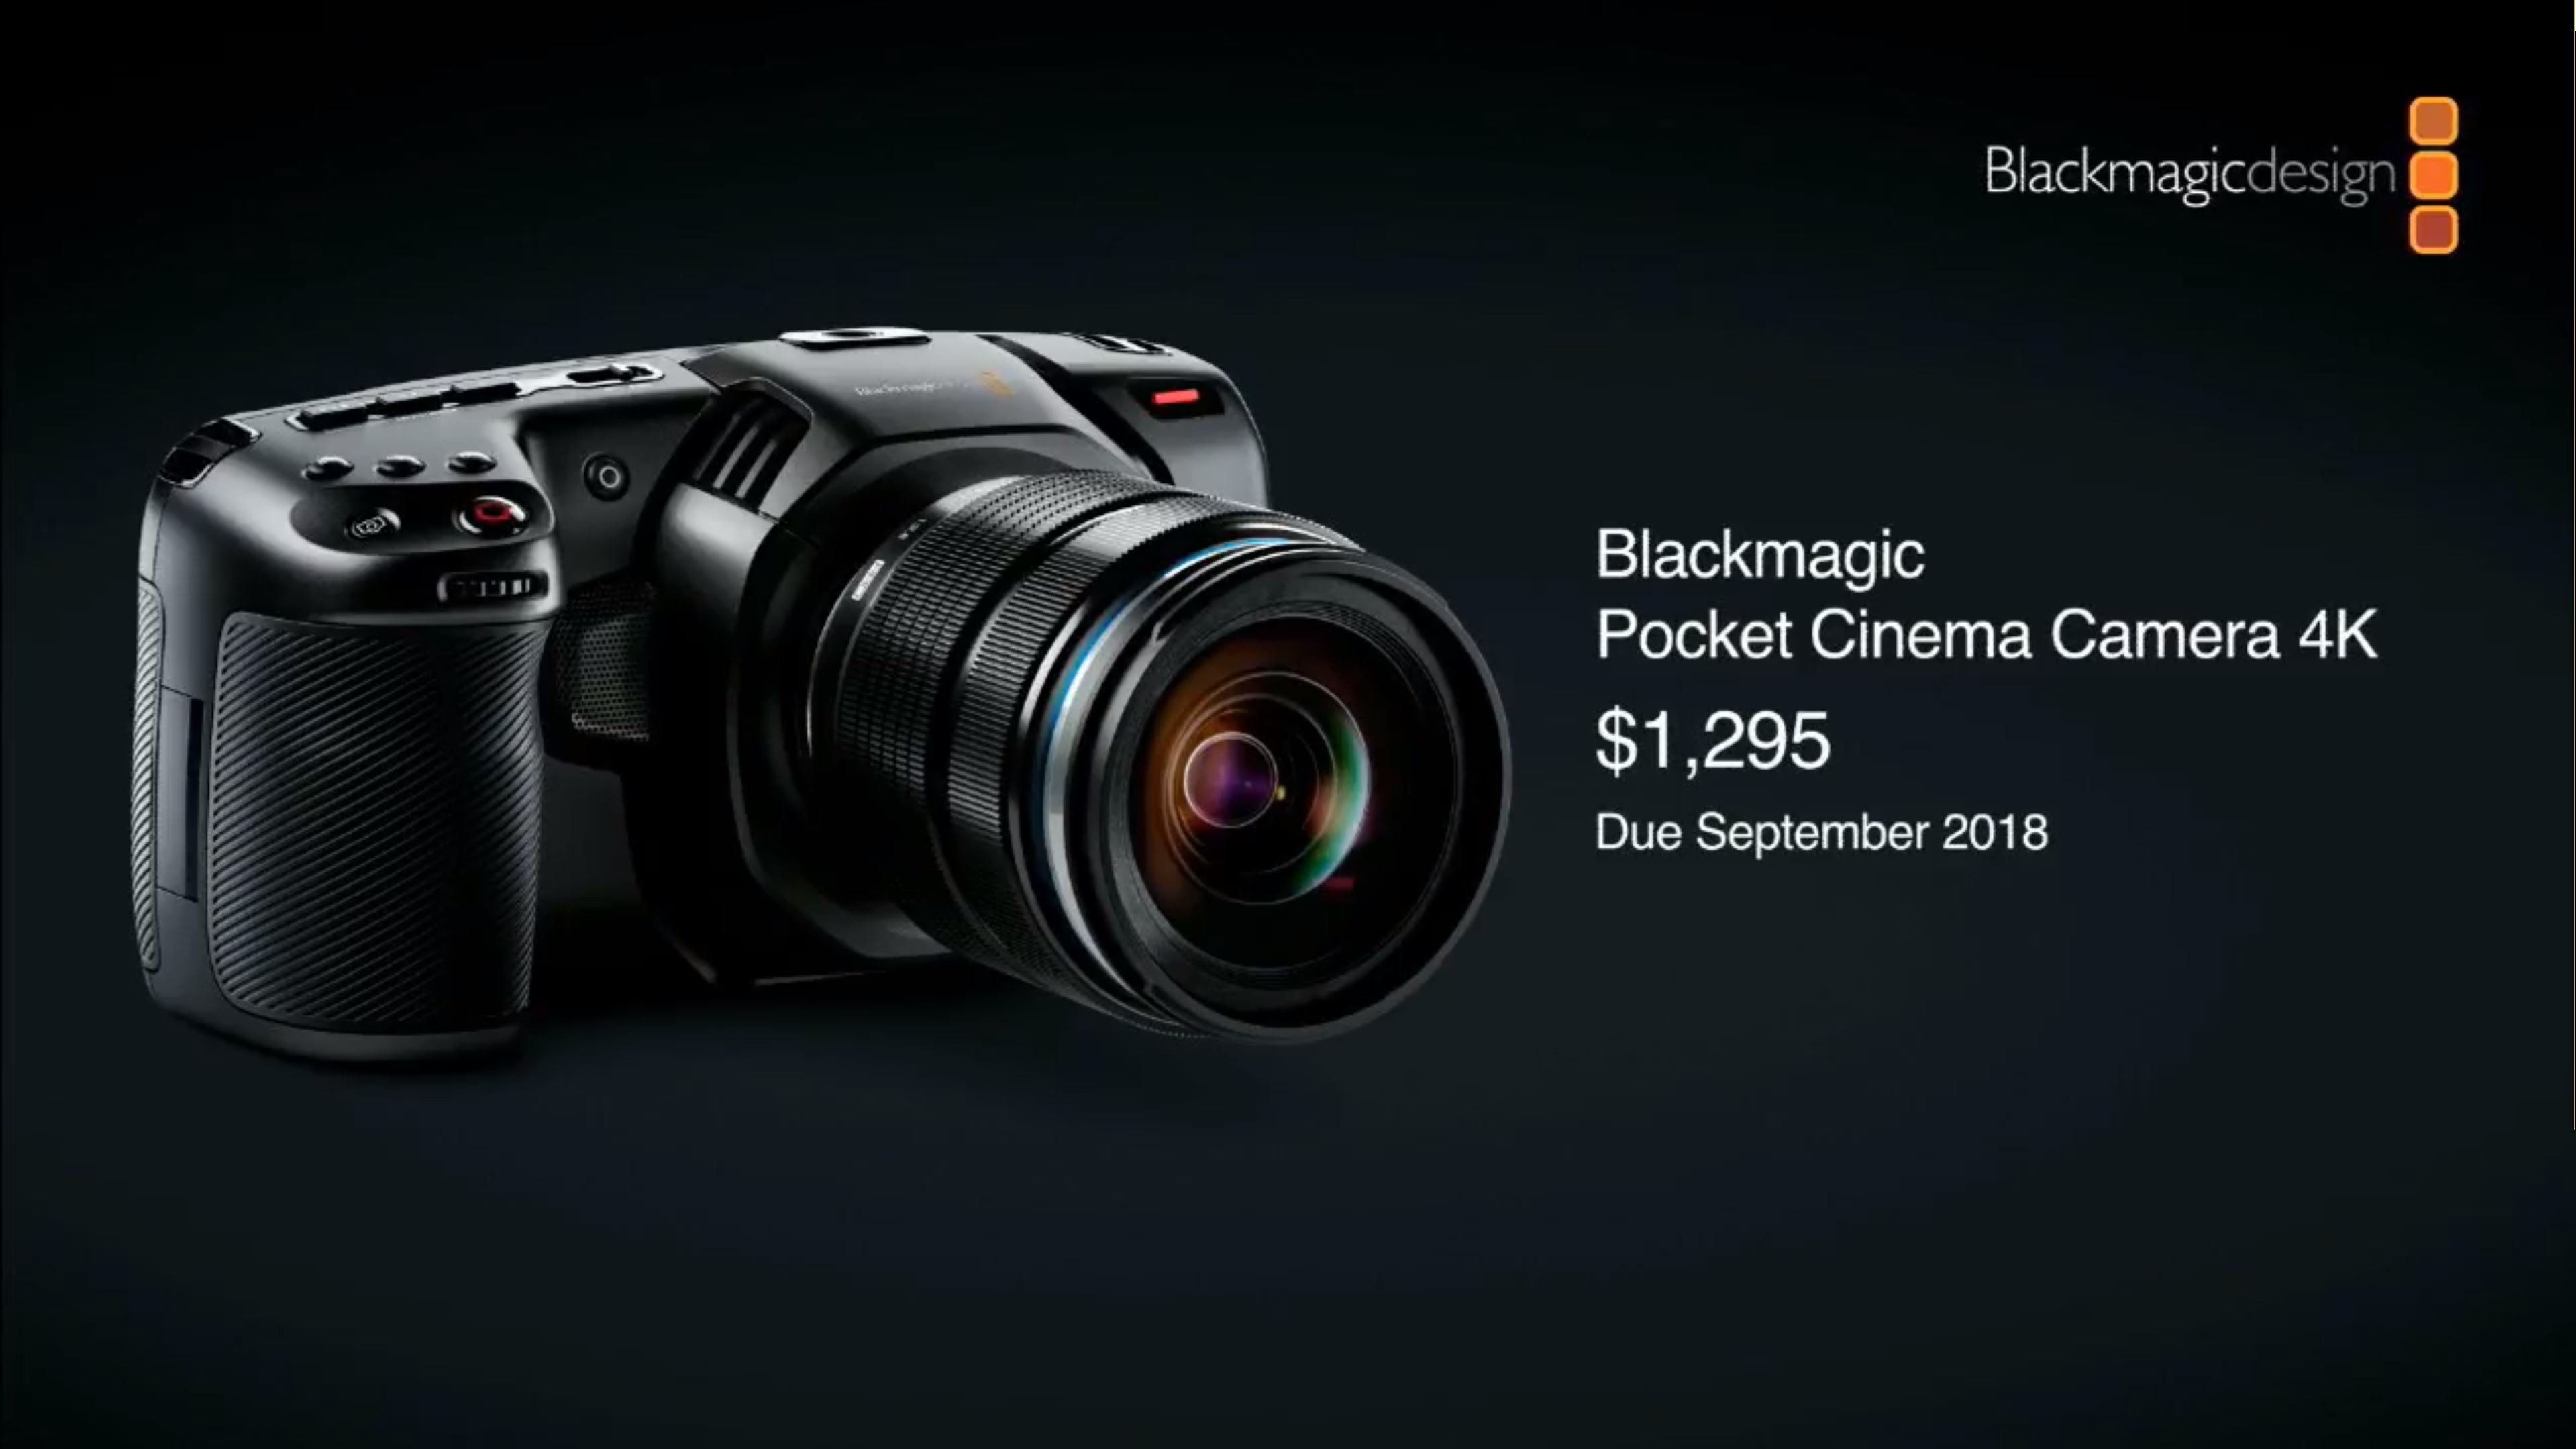 Blackmagic Pocket Cinema Camera 4k Is Here Focuspulling Com